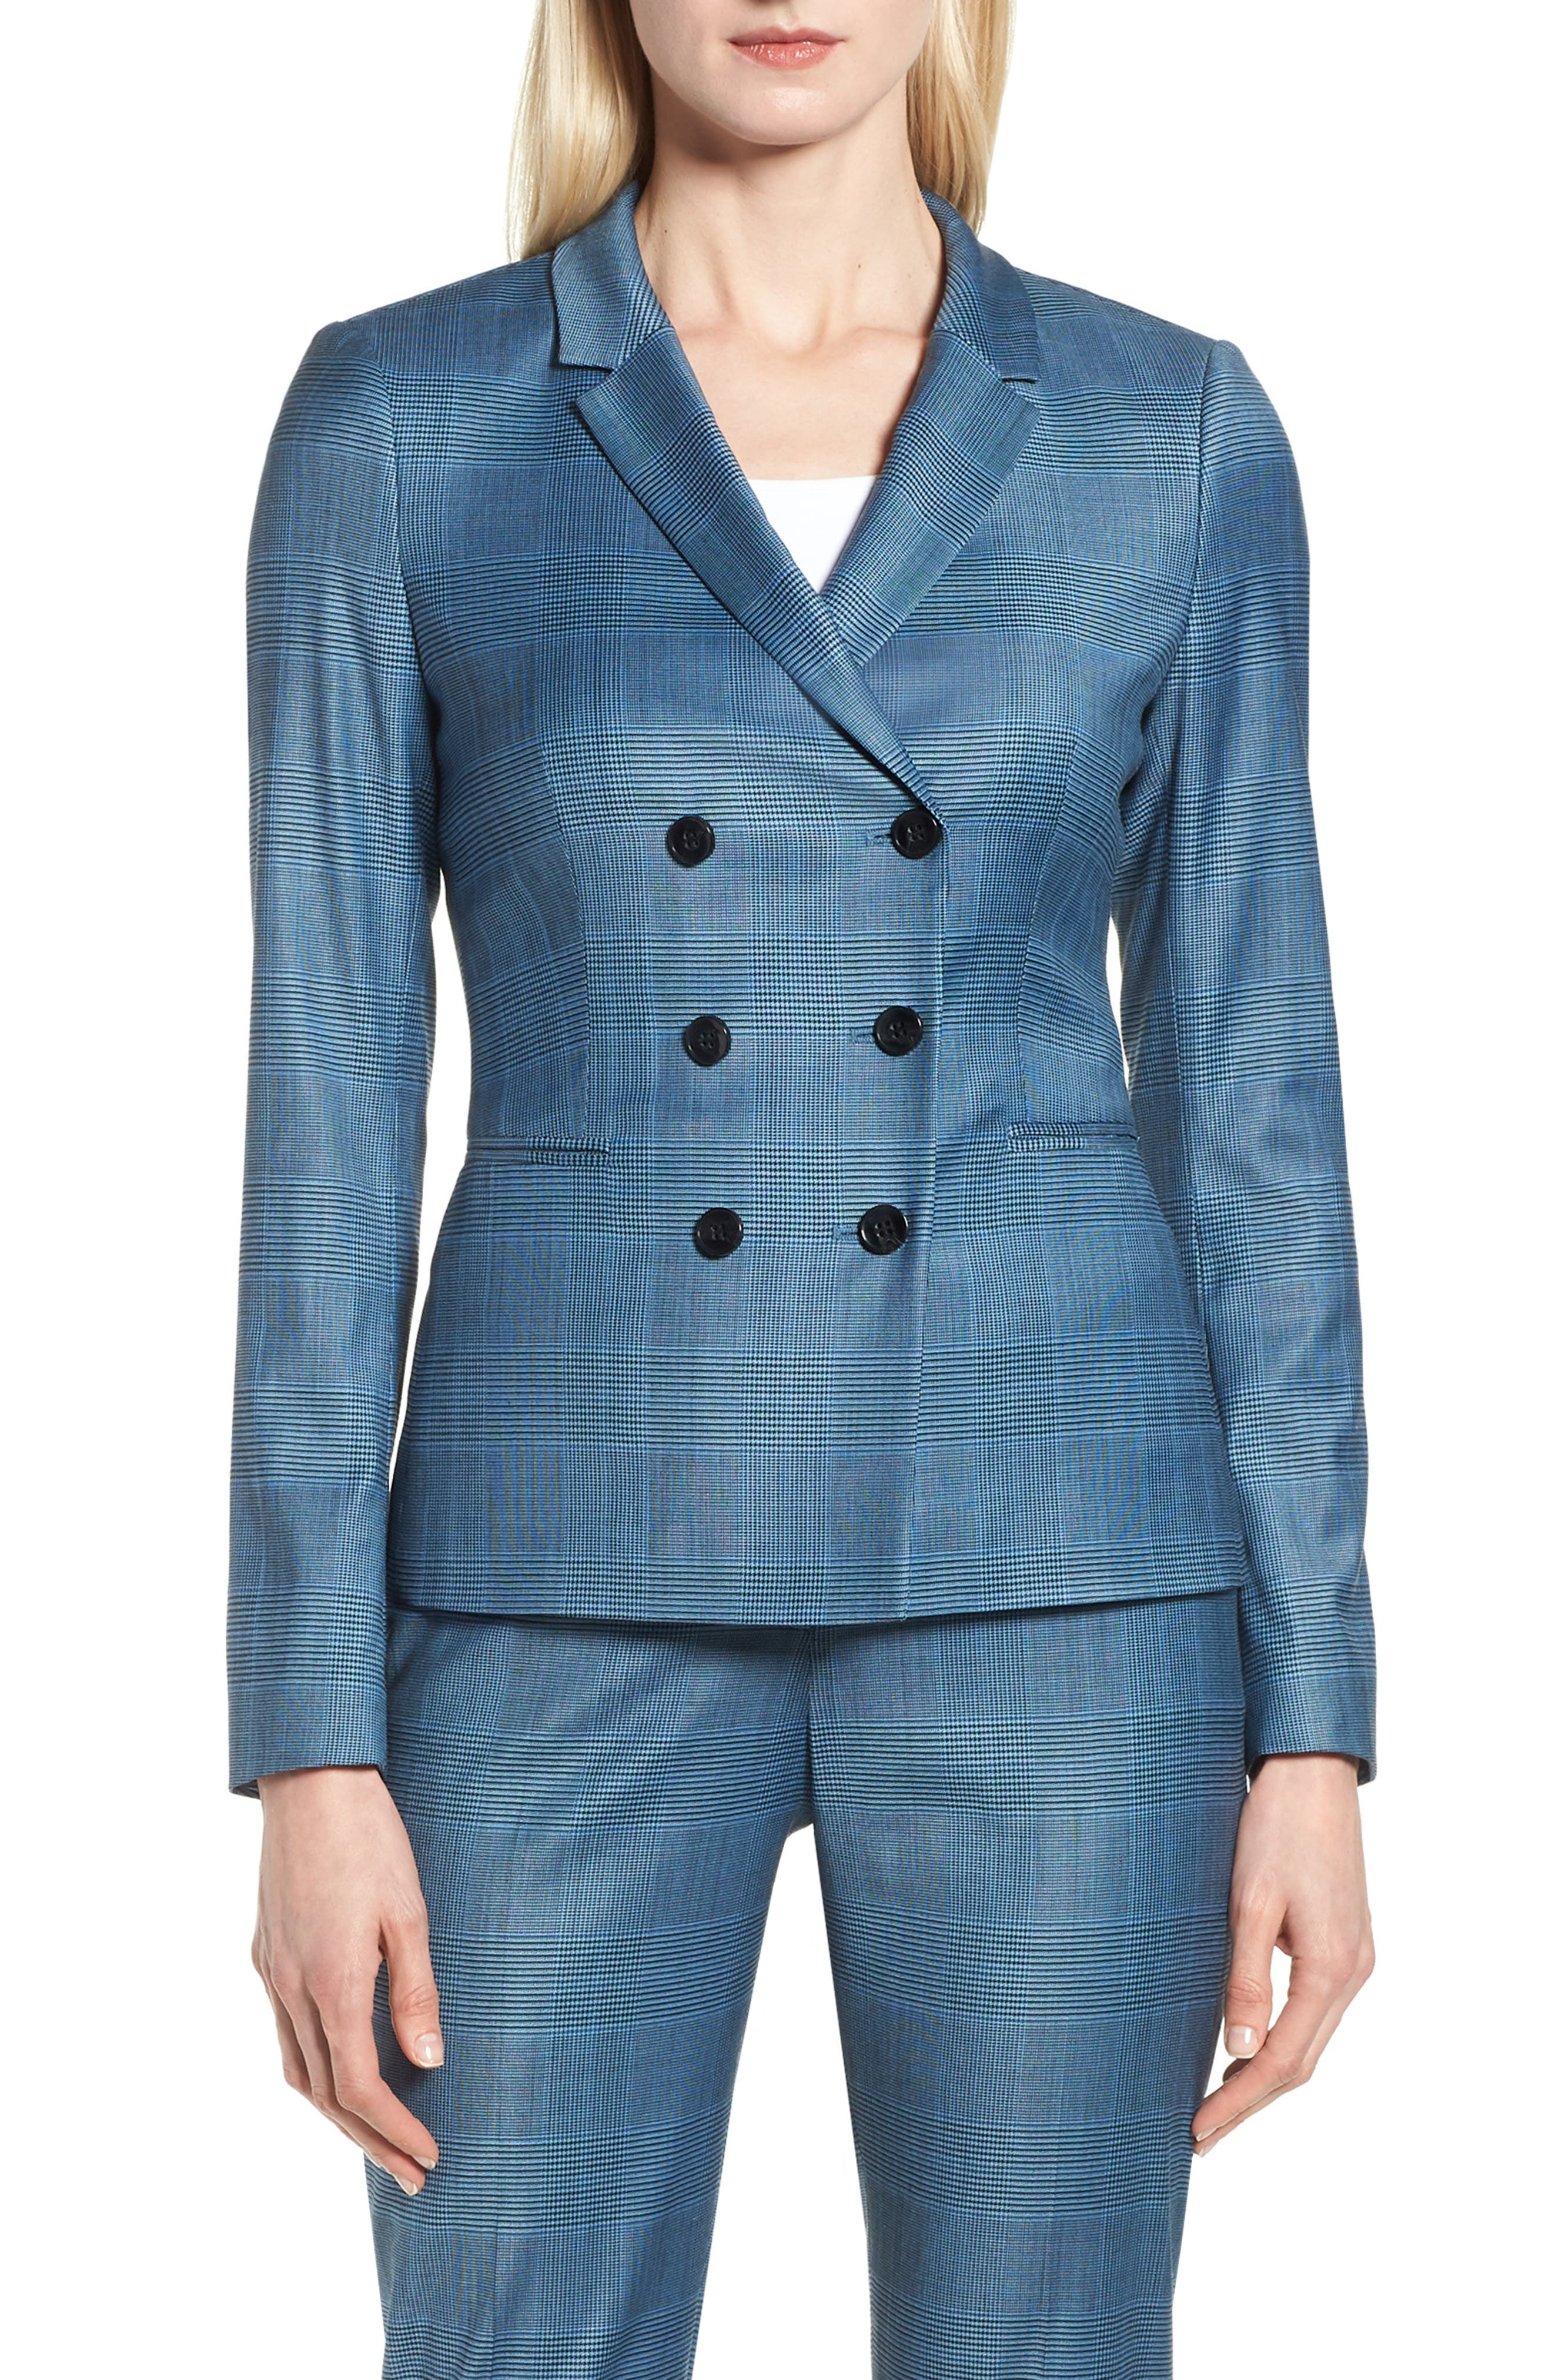 Jelaya Glencheck Double Breasted Suit Jacket,                             Main thumbnail 1, color,                             467